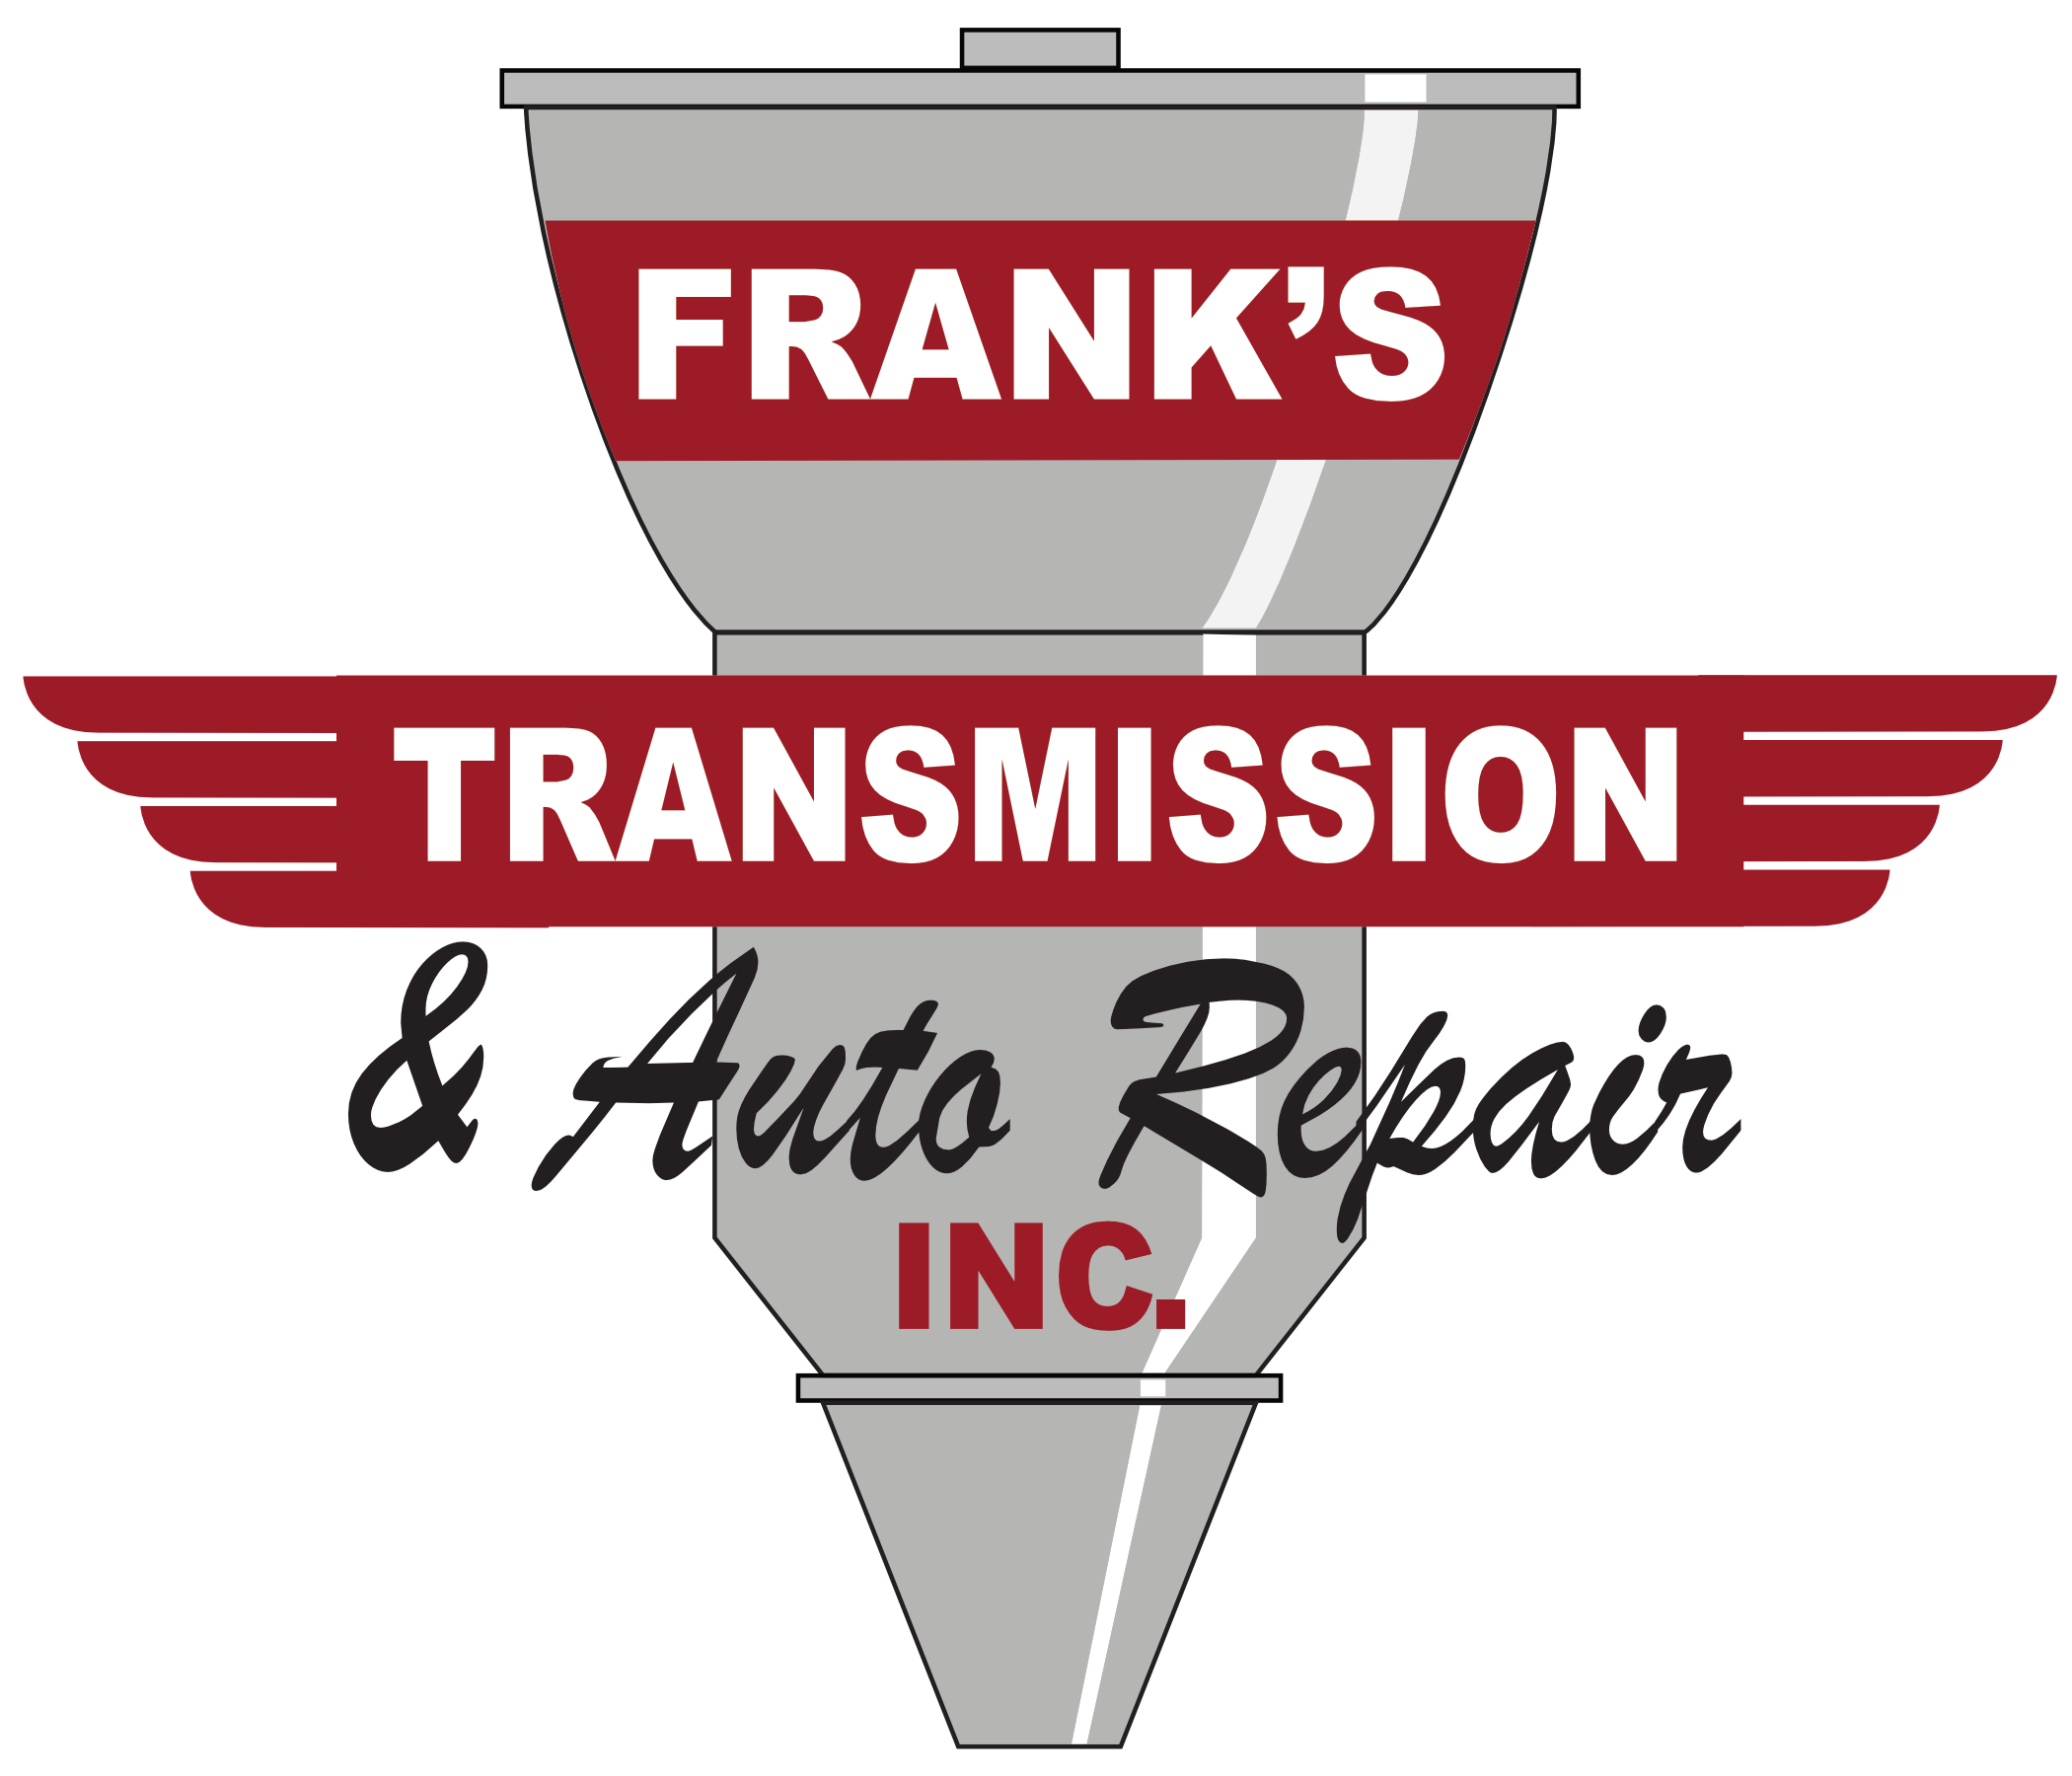 Frank's Transmission Inc.